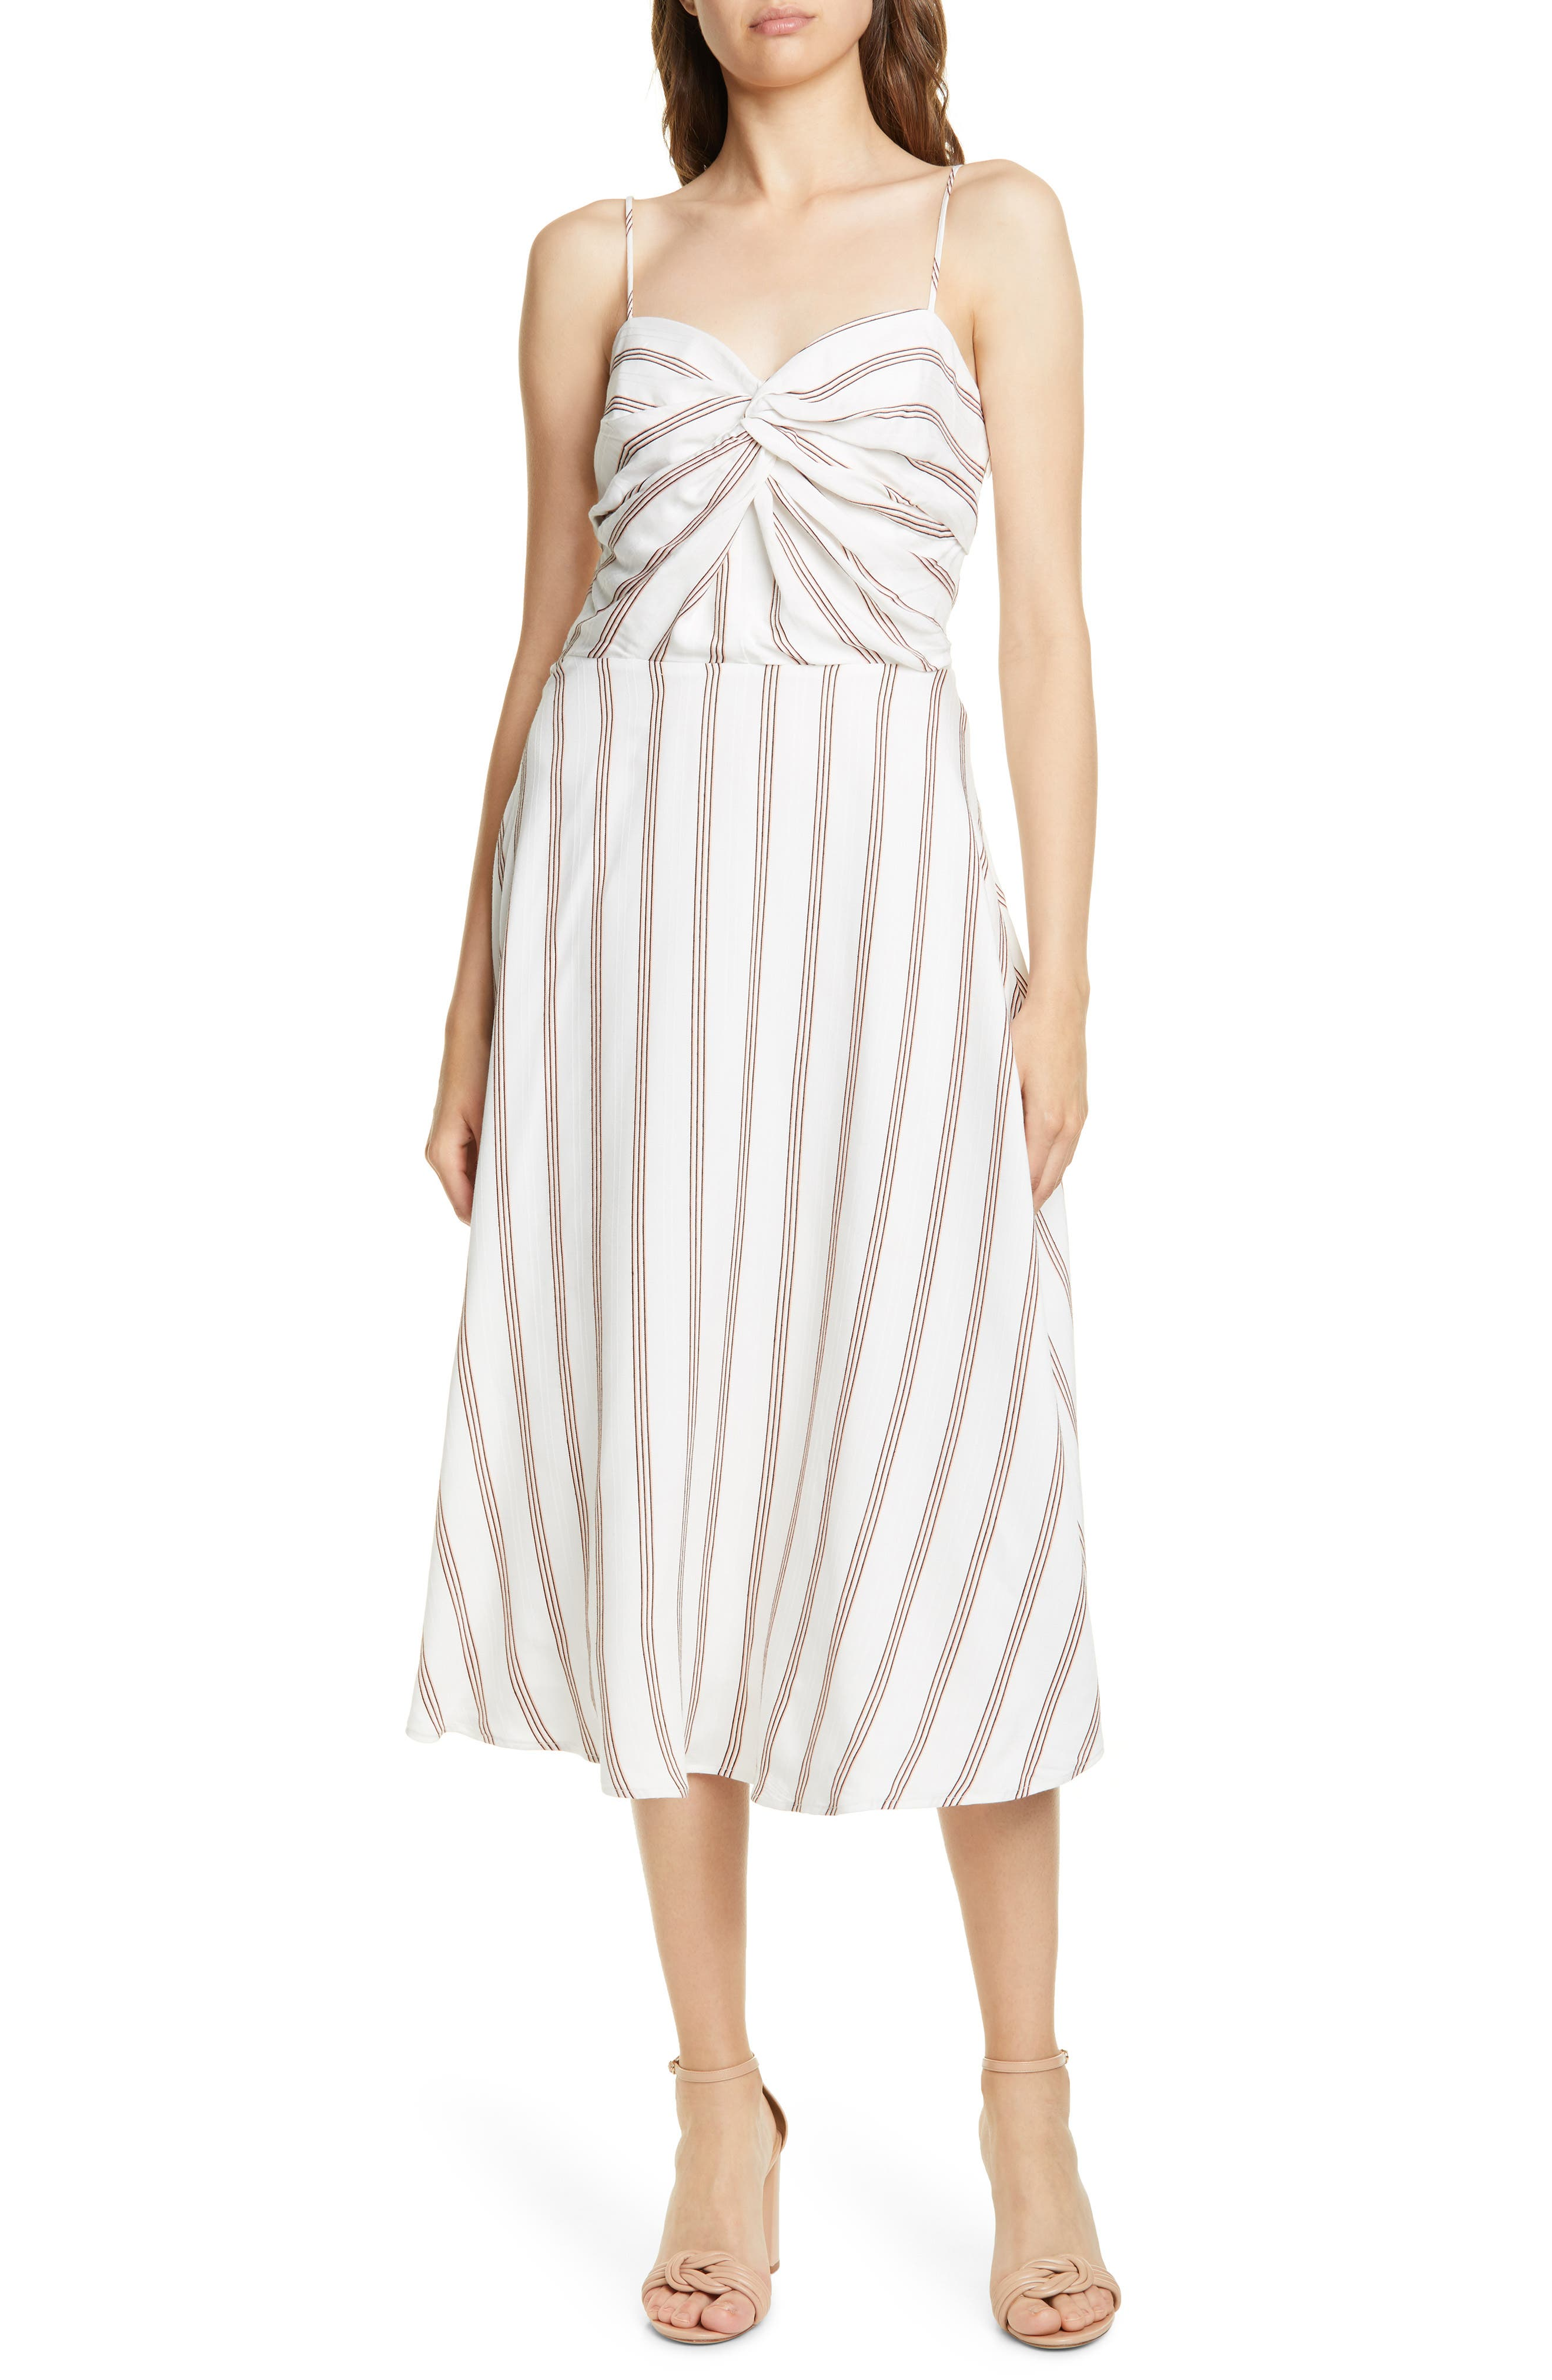 Joie Chalten Stripe Sundress, Ivory